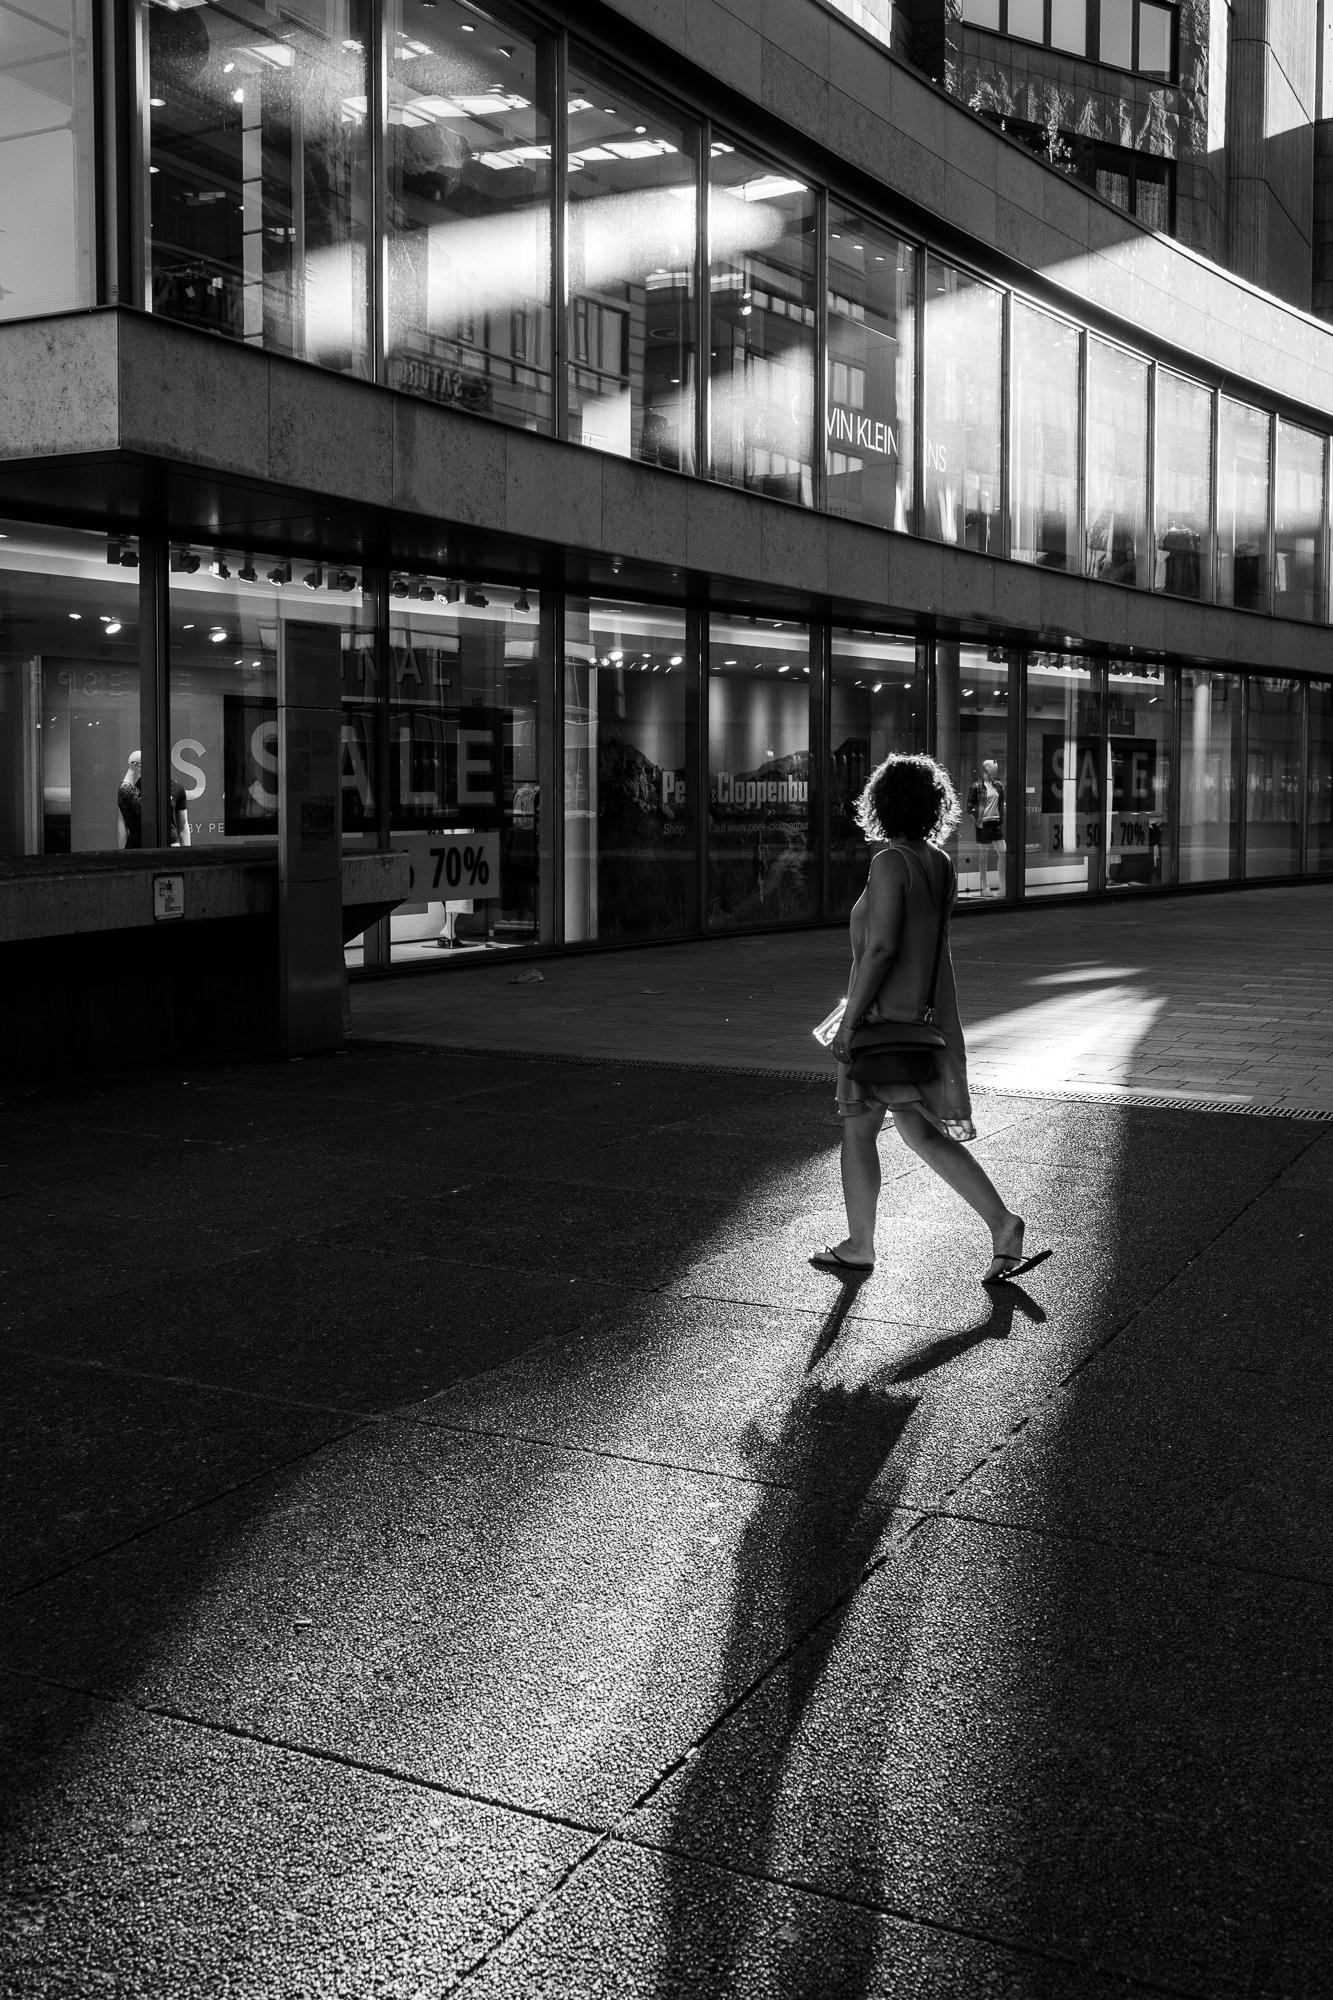 querformat-fotografie - Achim Katzberg - querformat-fotografie_MKG_VErnissage-032